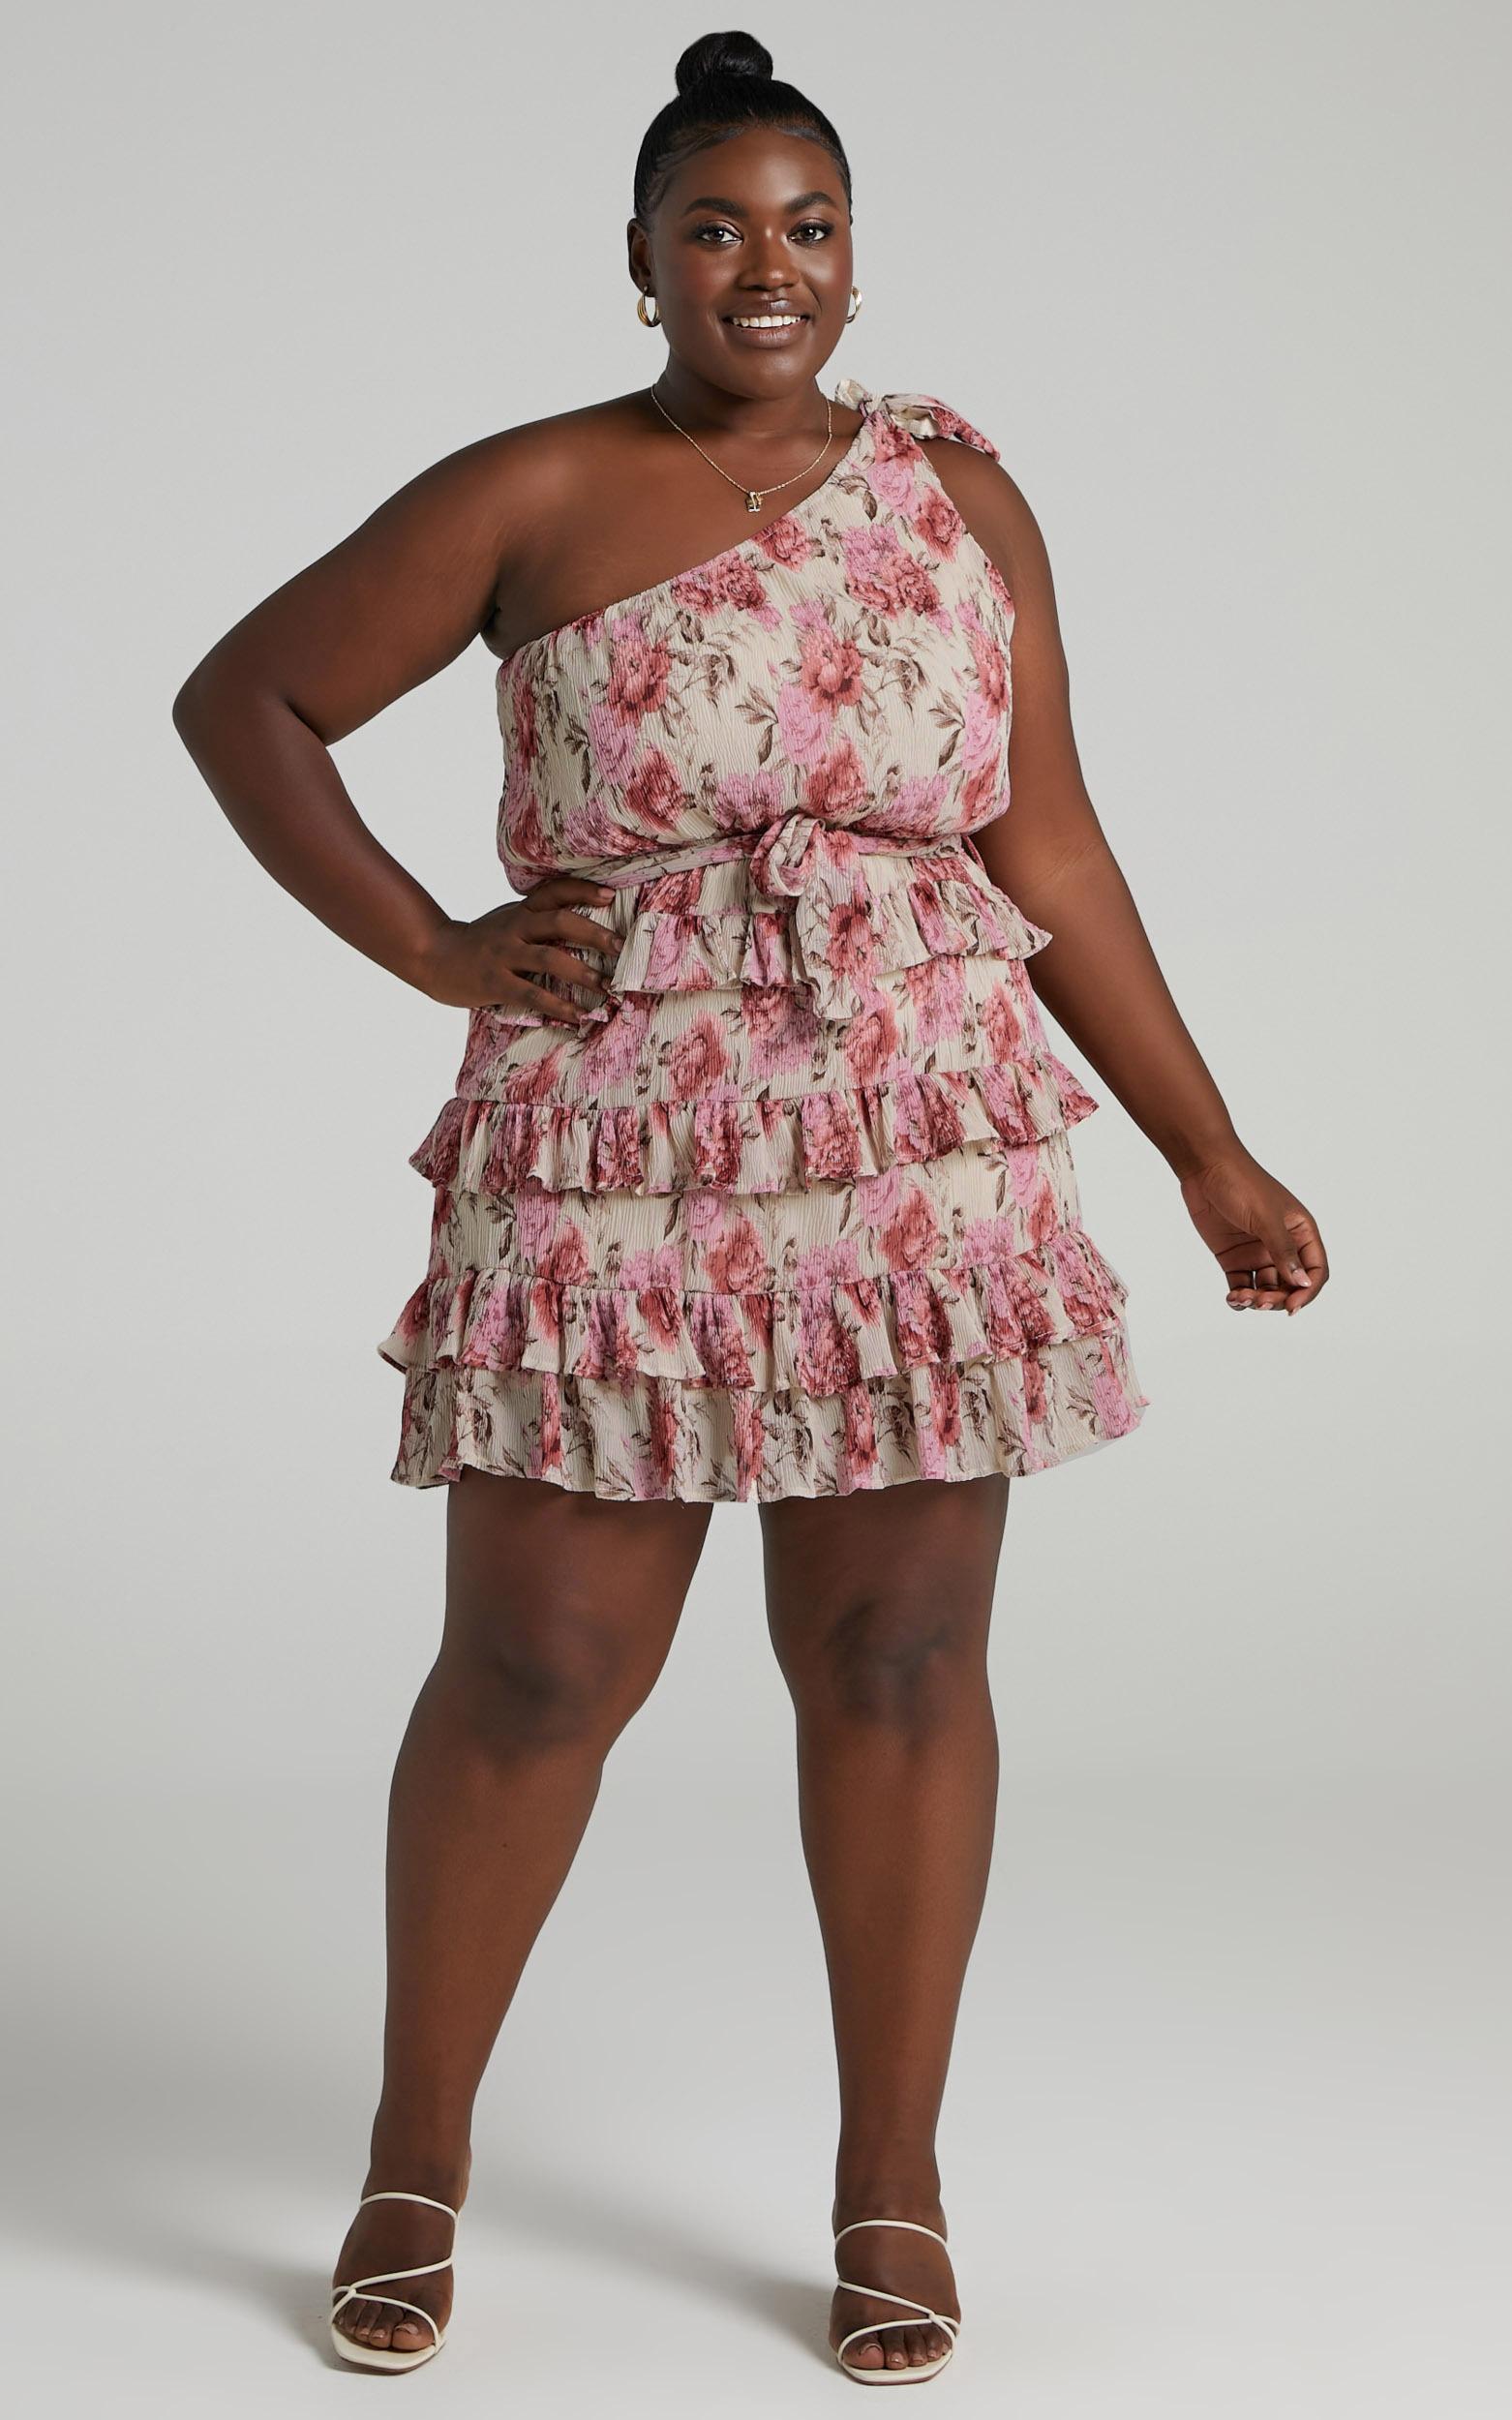 Love You More Dress in Rose Floral - 14, PNK1, hi-res image number null